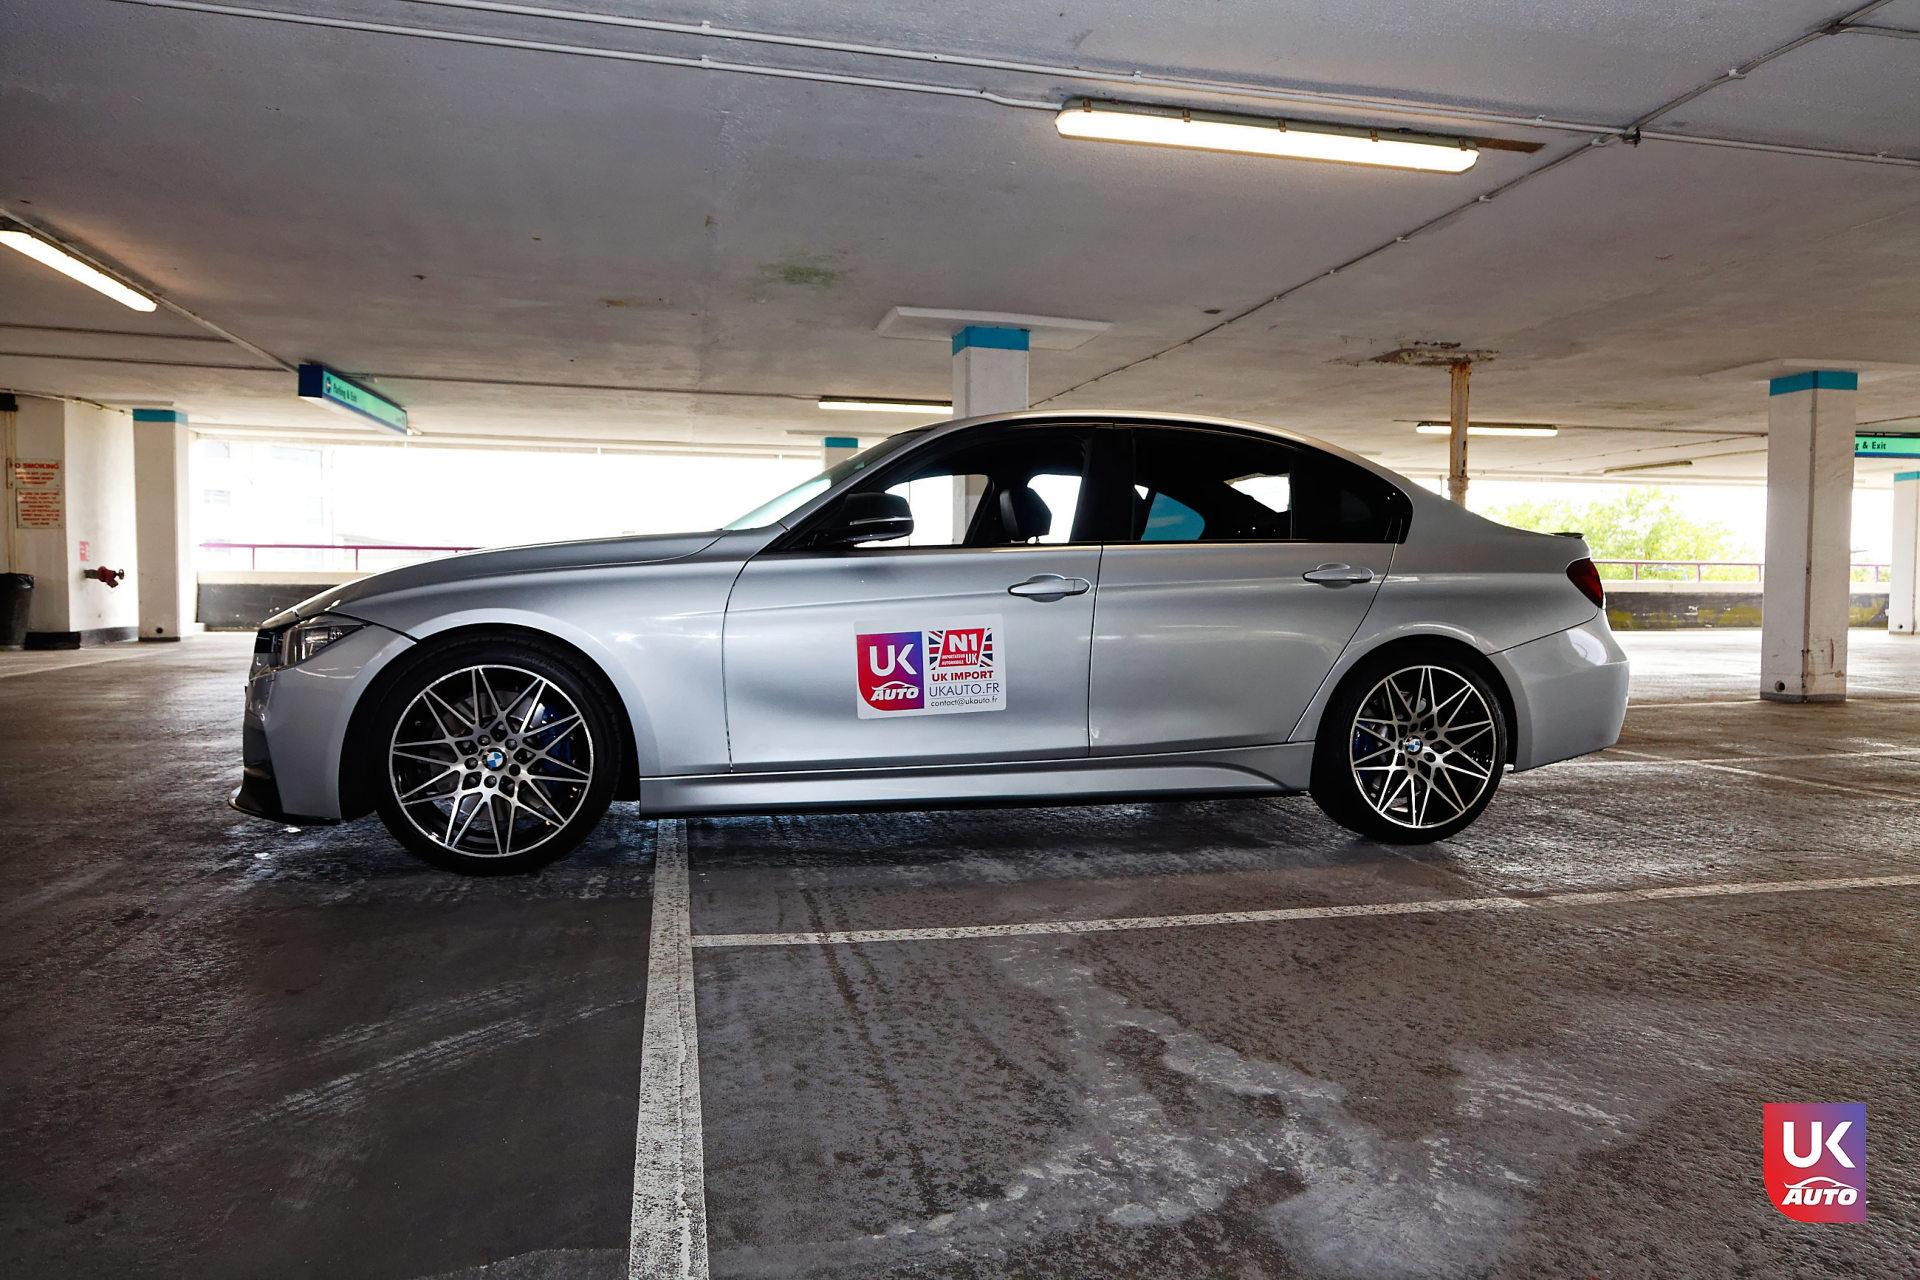 Bmw 335I IMPORT F30 eric drouet import bmw occasion rhd mandataire bmw angleterre3 DxO - IMPORTATION BMW 335 I FELICITATION A ERIC DROUET BMW VOITURE SPORTIVE UK